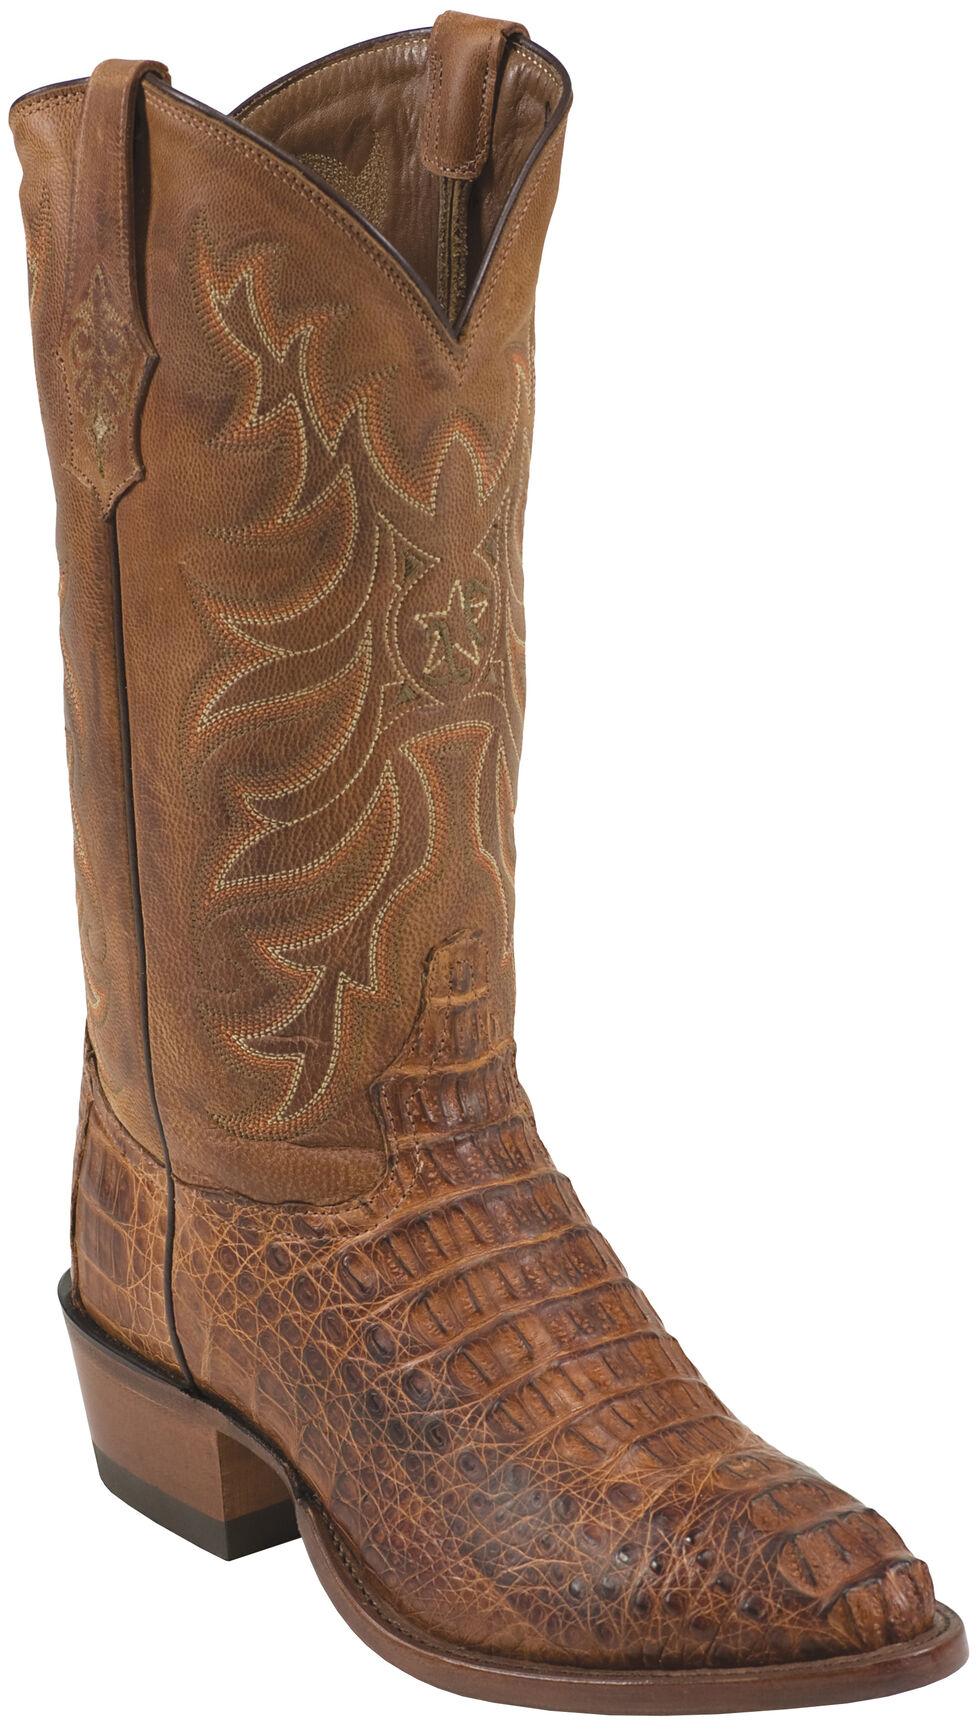 Tony Lama Men's Reydon Cognac Vintage Hornback Caiman Cowboy Boots - Medium Toe , Cognac, hi-res